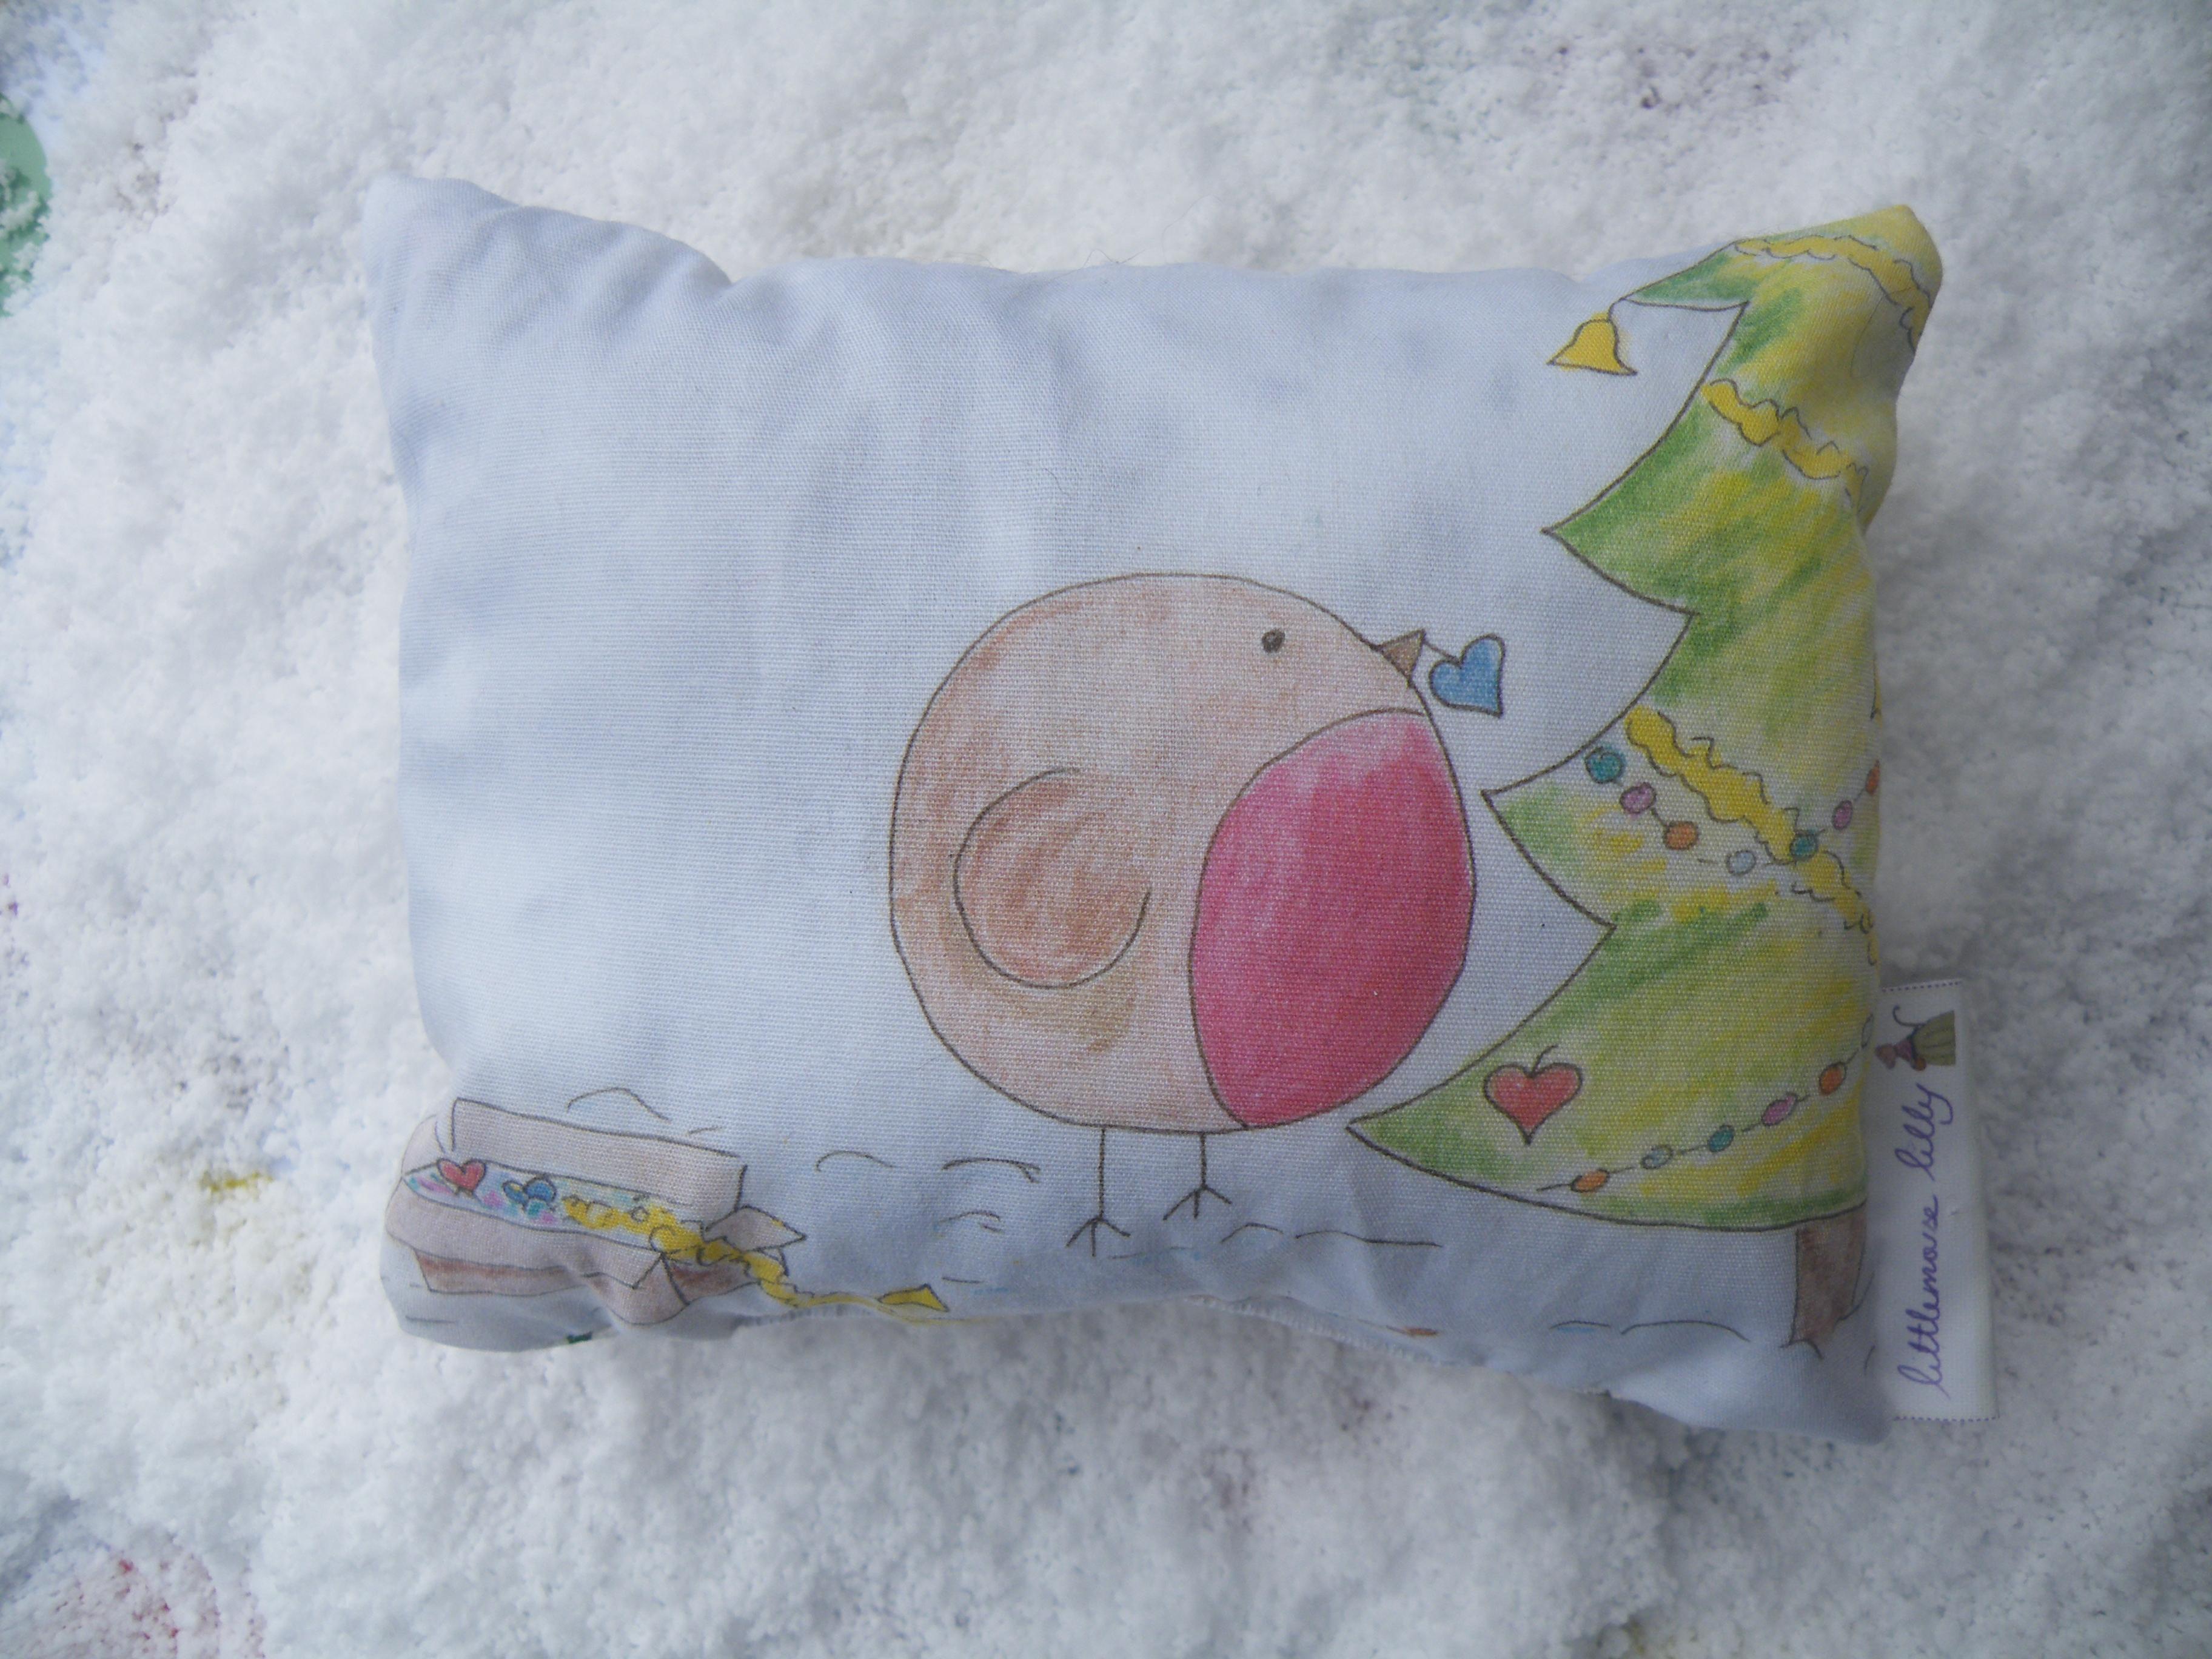 decorar cojines navideños - funda de cojín pintada